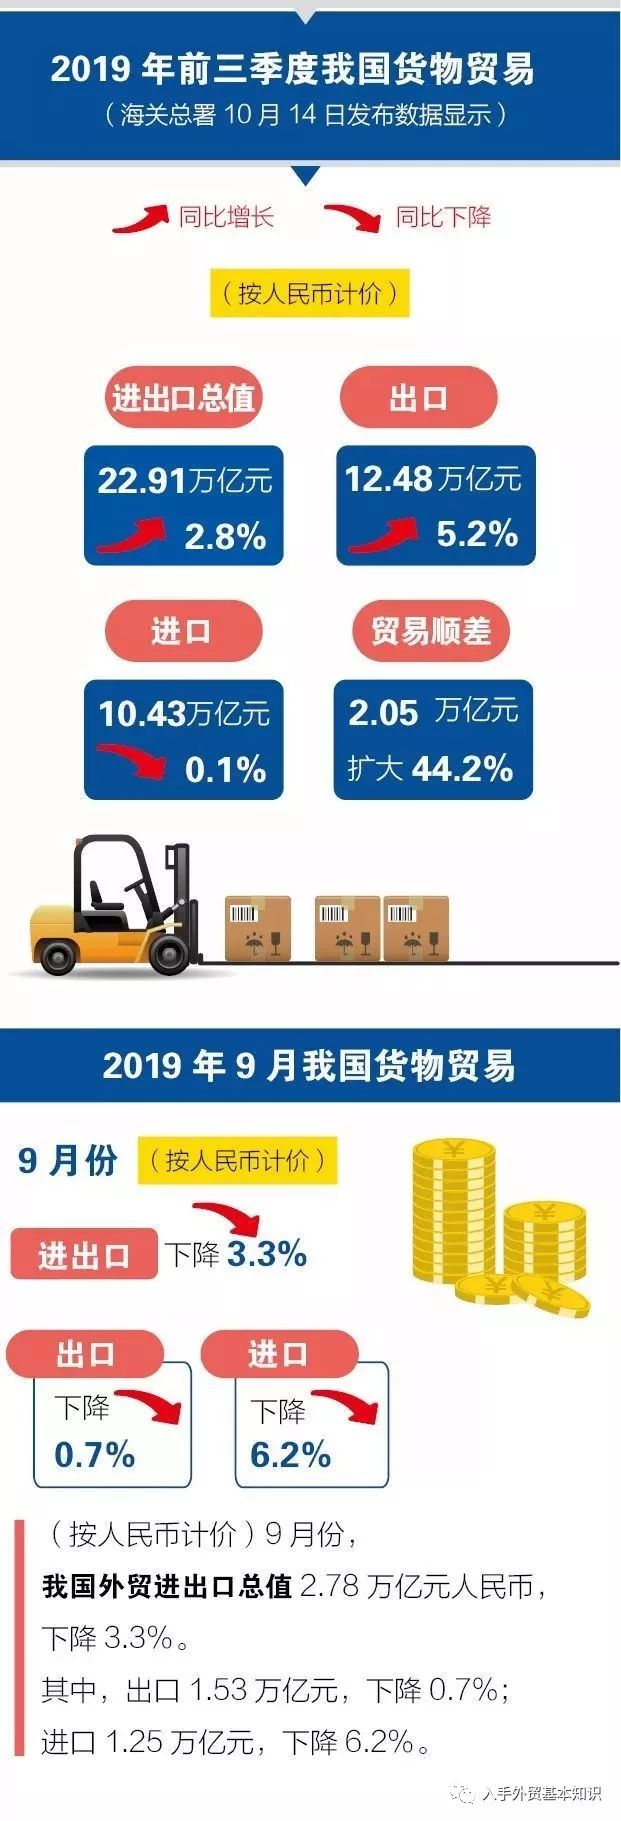 <b>玛雅poweredby一图看懂2019年前三季度中国外贸进出</b>